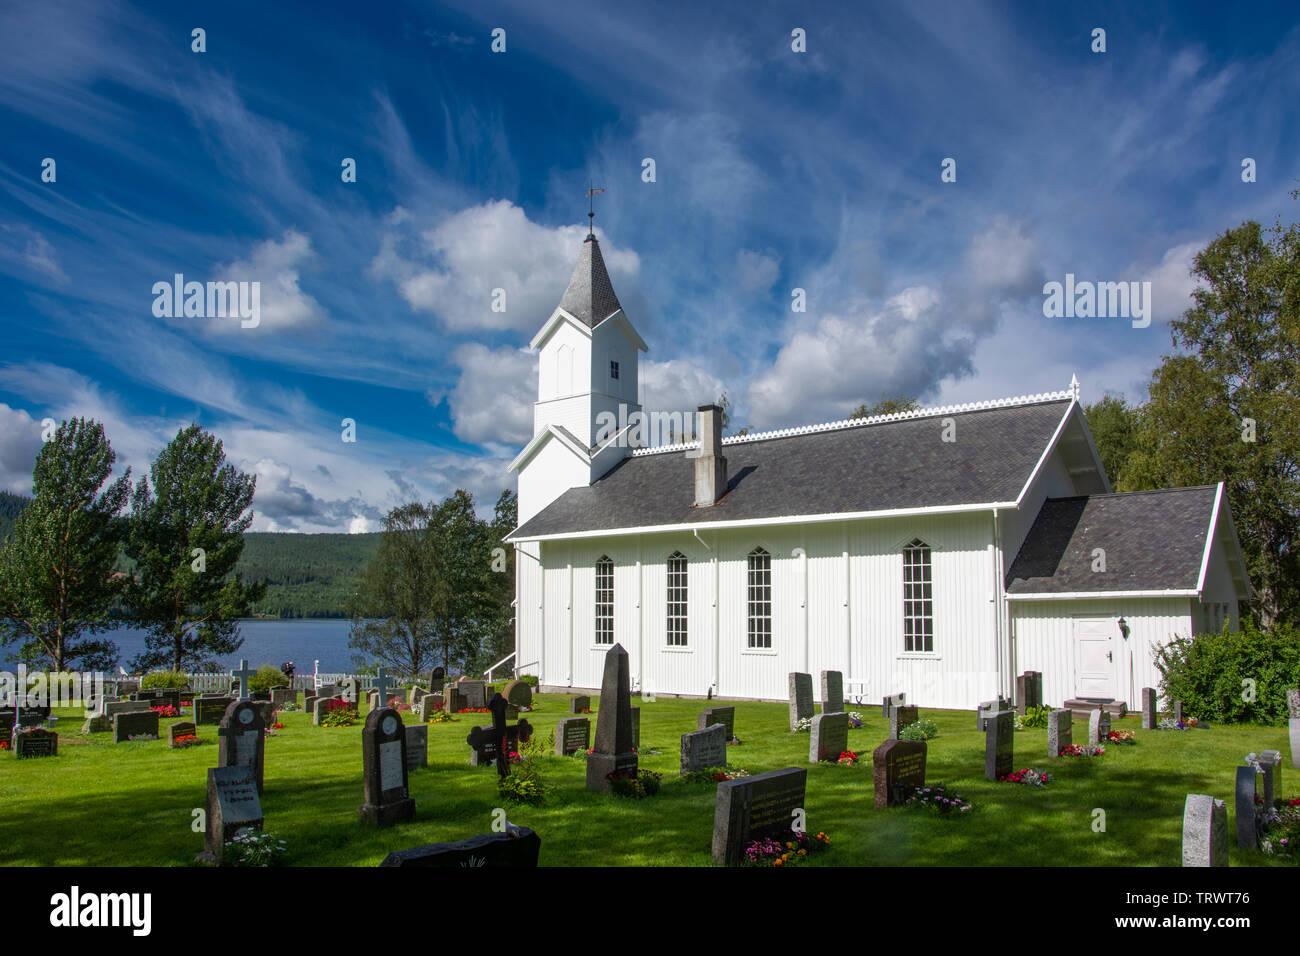 Søre Osen church in Osensjoen in Norway / Scandinava Stock Photo